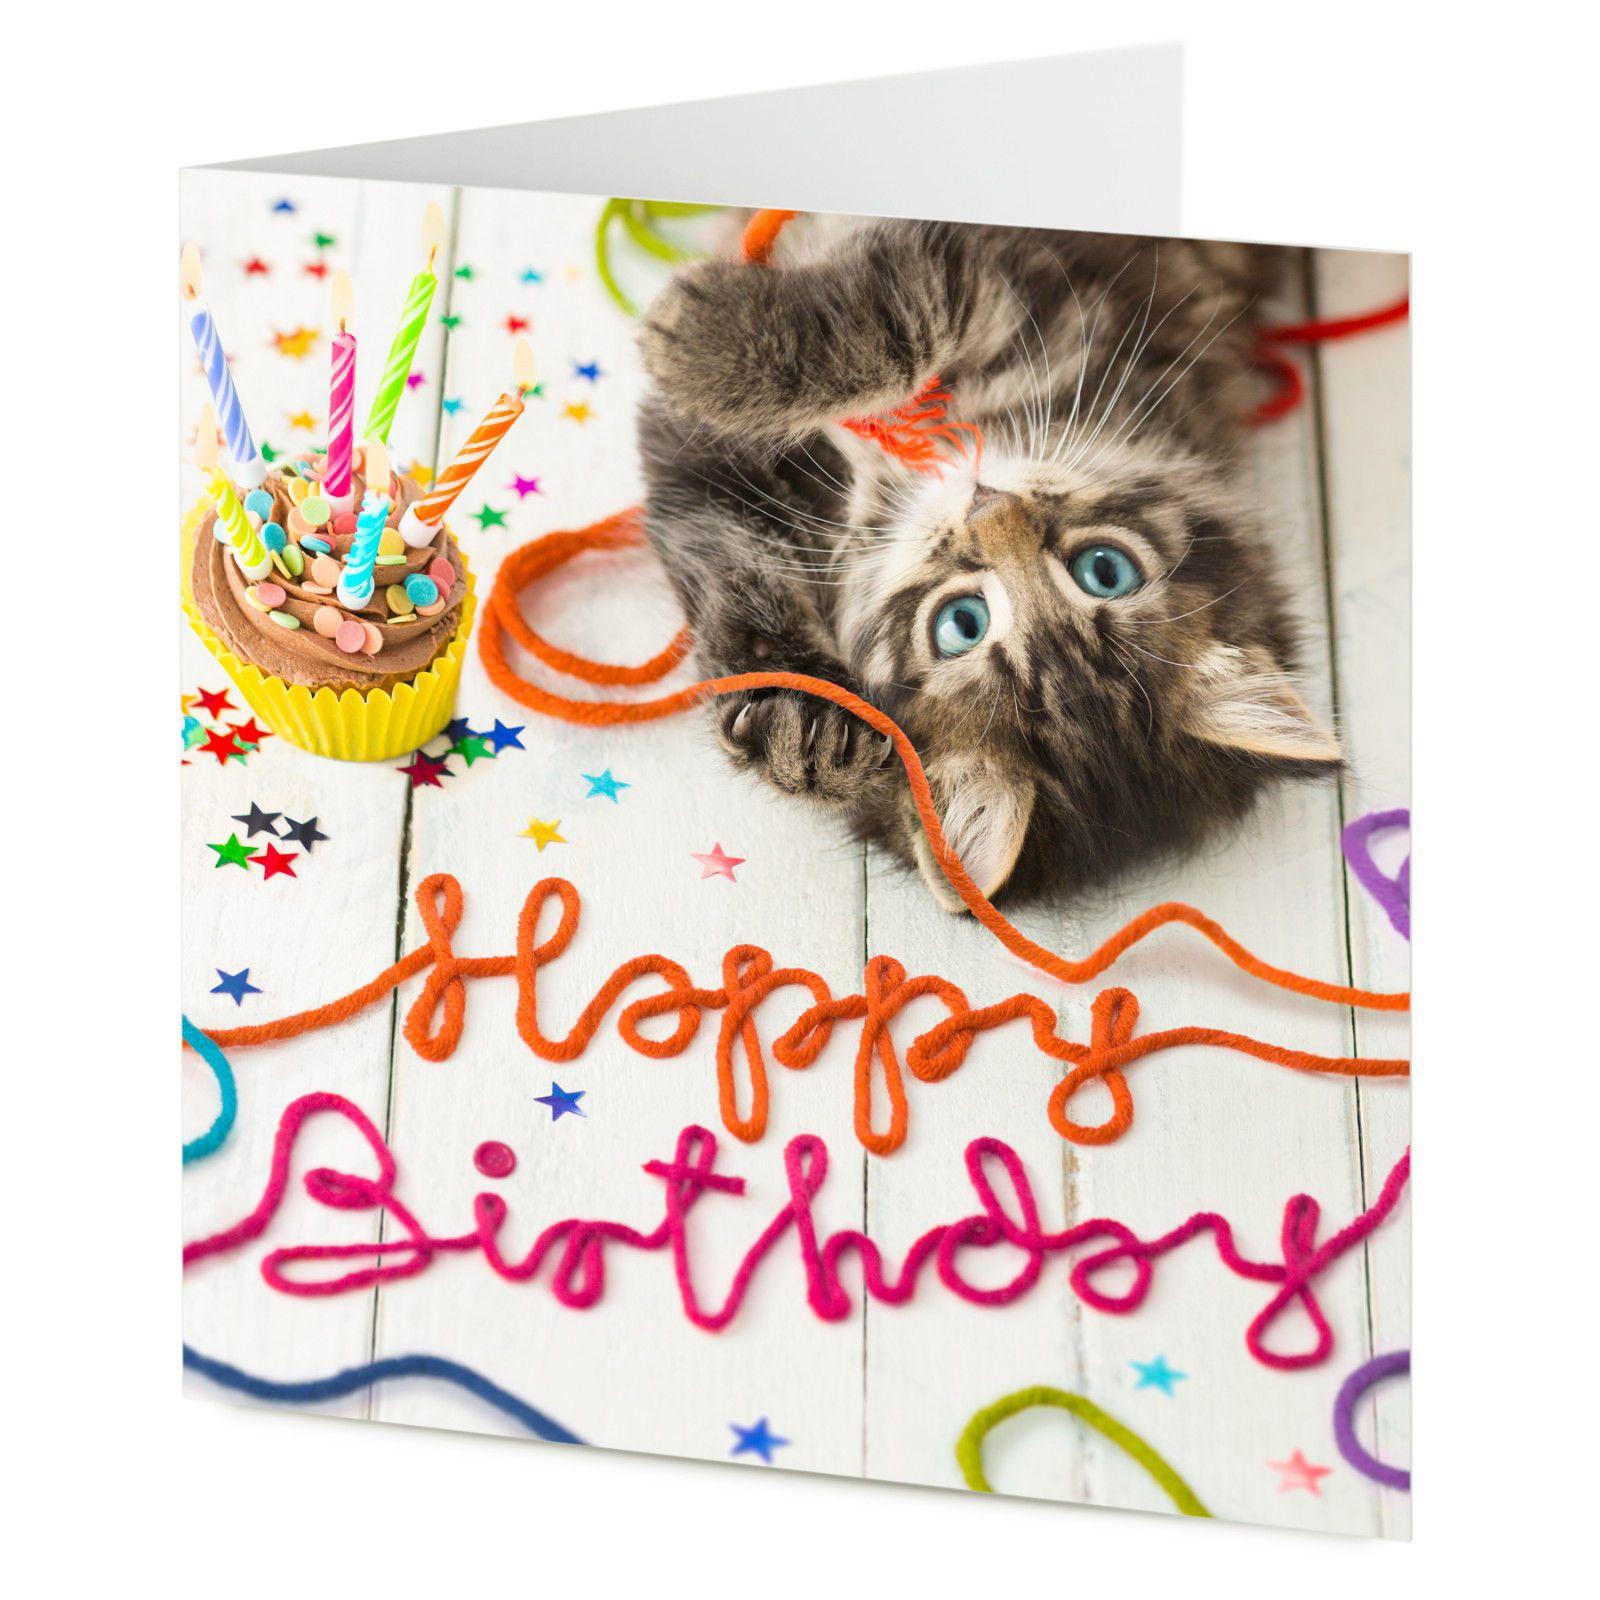 Happy Birthday Cute Cat Kitten Playing With Wool Birthday Greetings